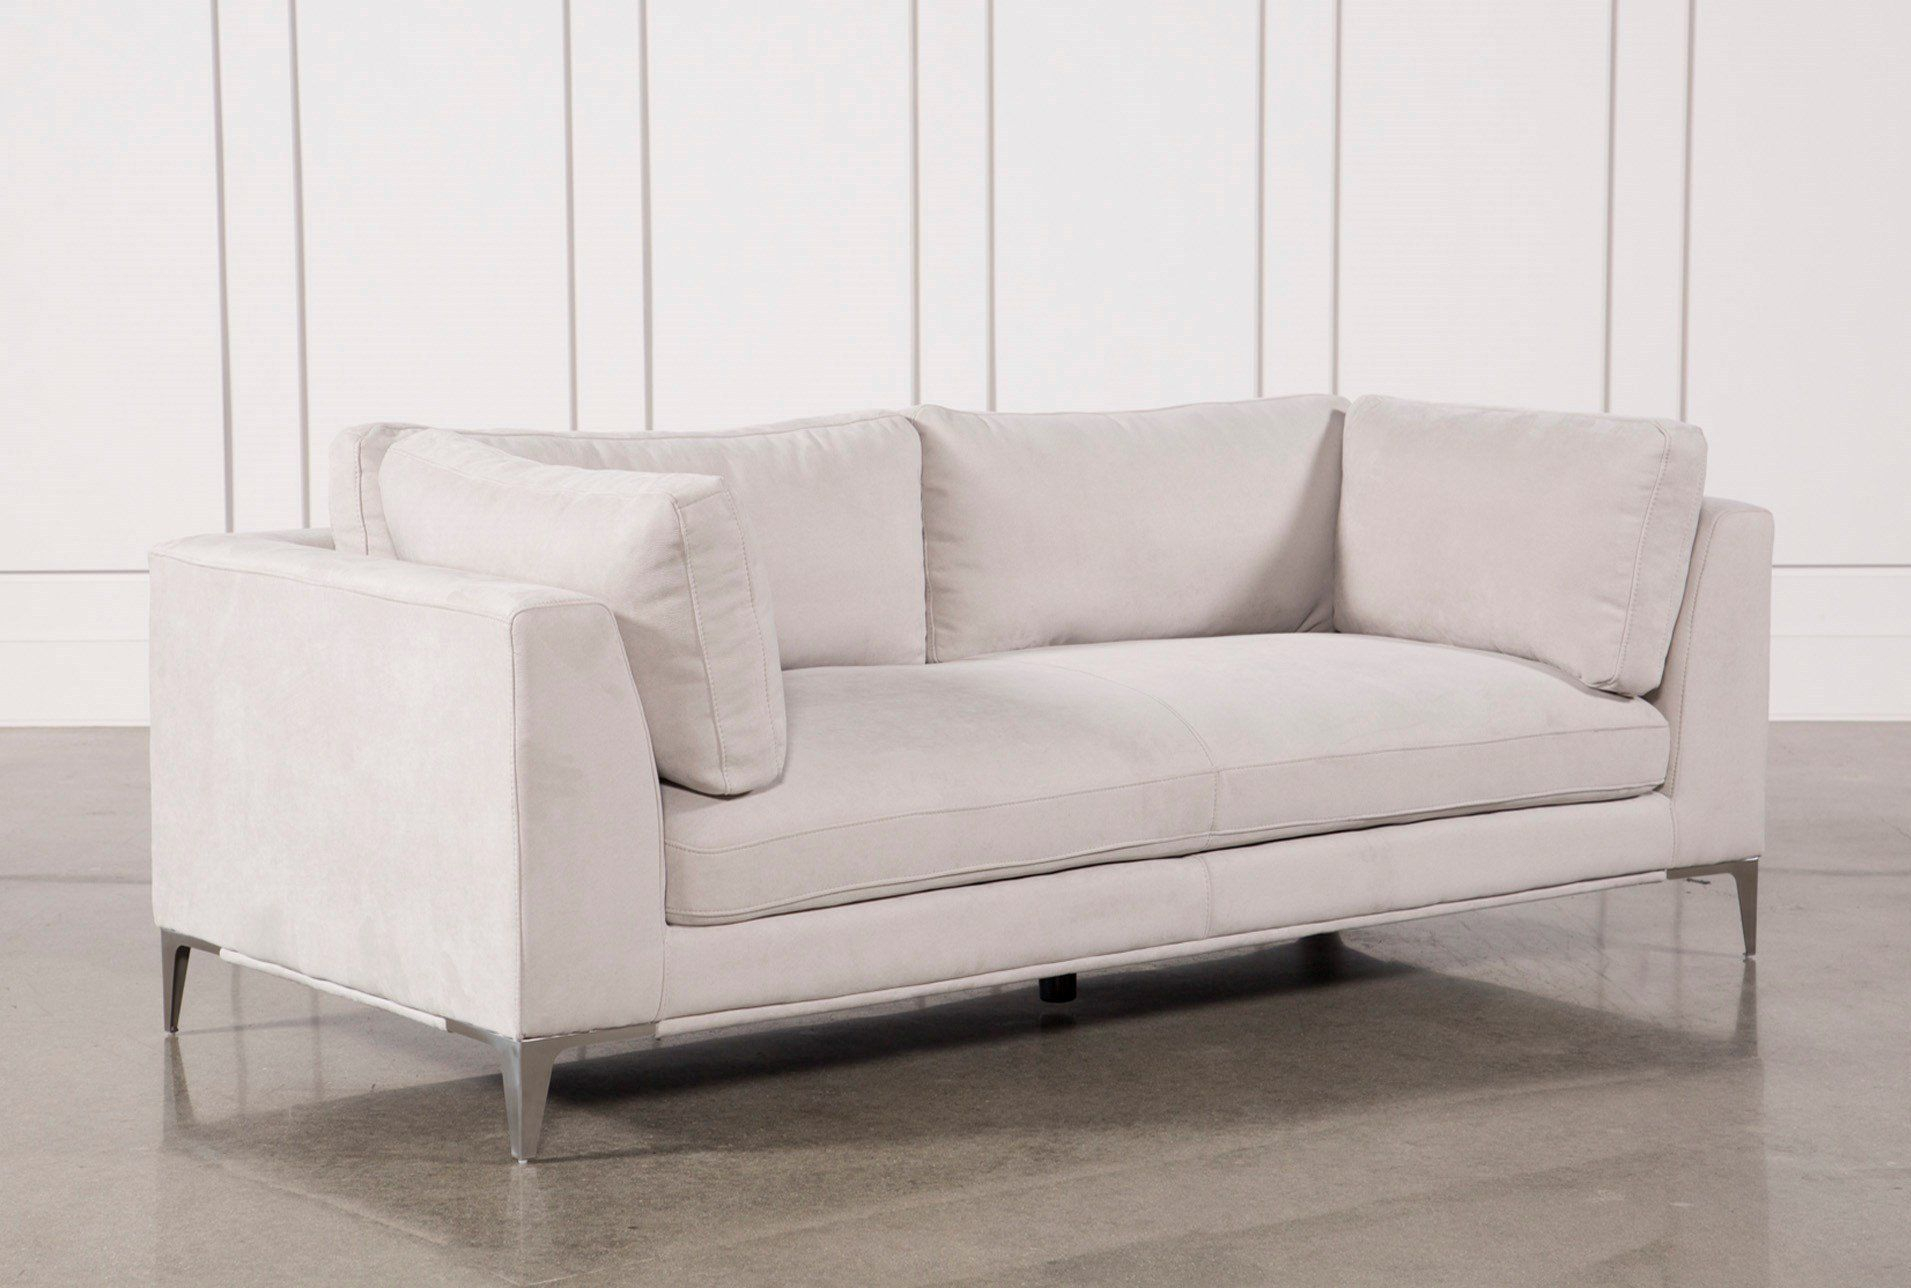 Apollo Light Grey Sofa W/2 Pillows Inside Escondido Sofa Chairs (Image 4 of 20)